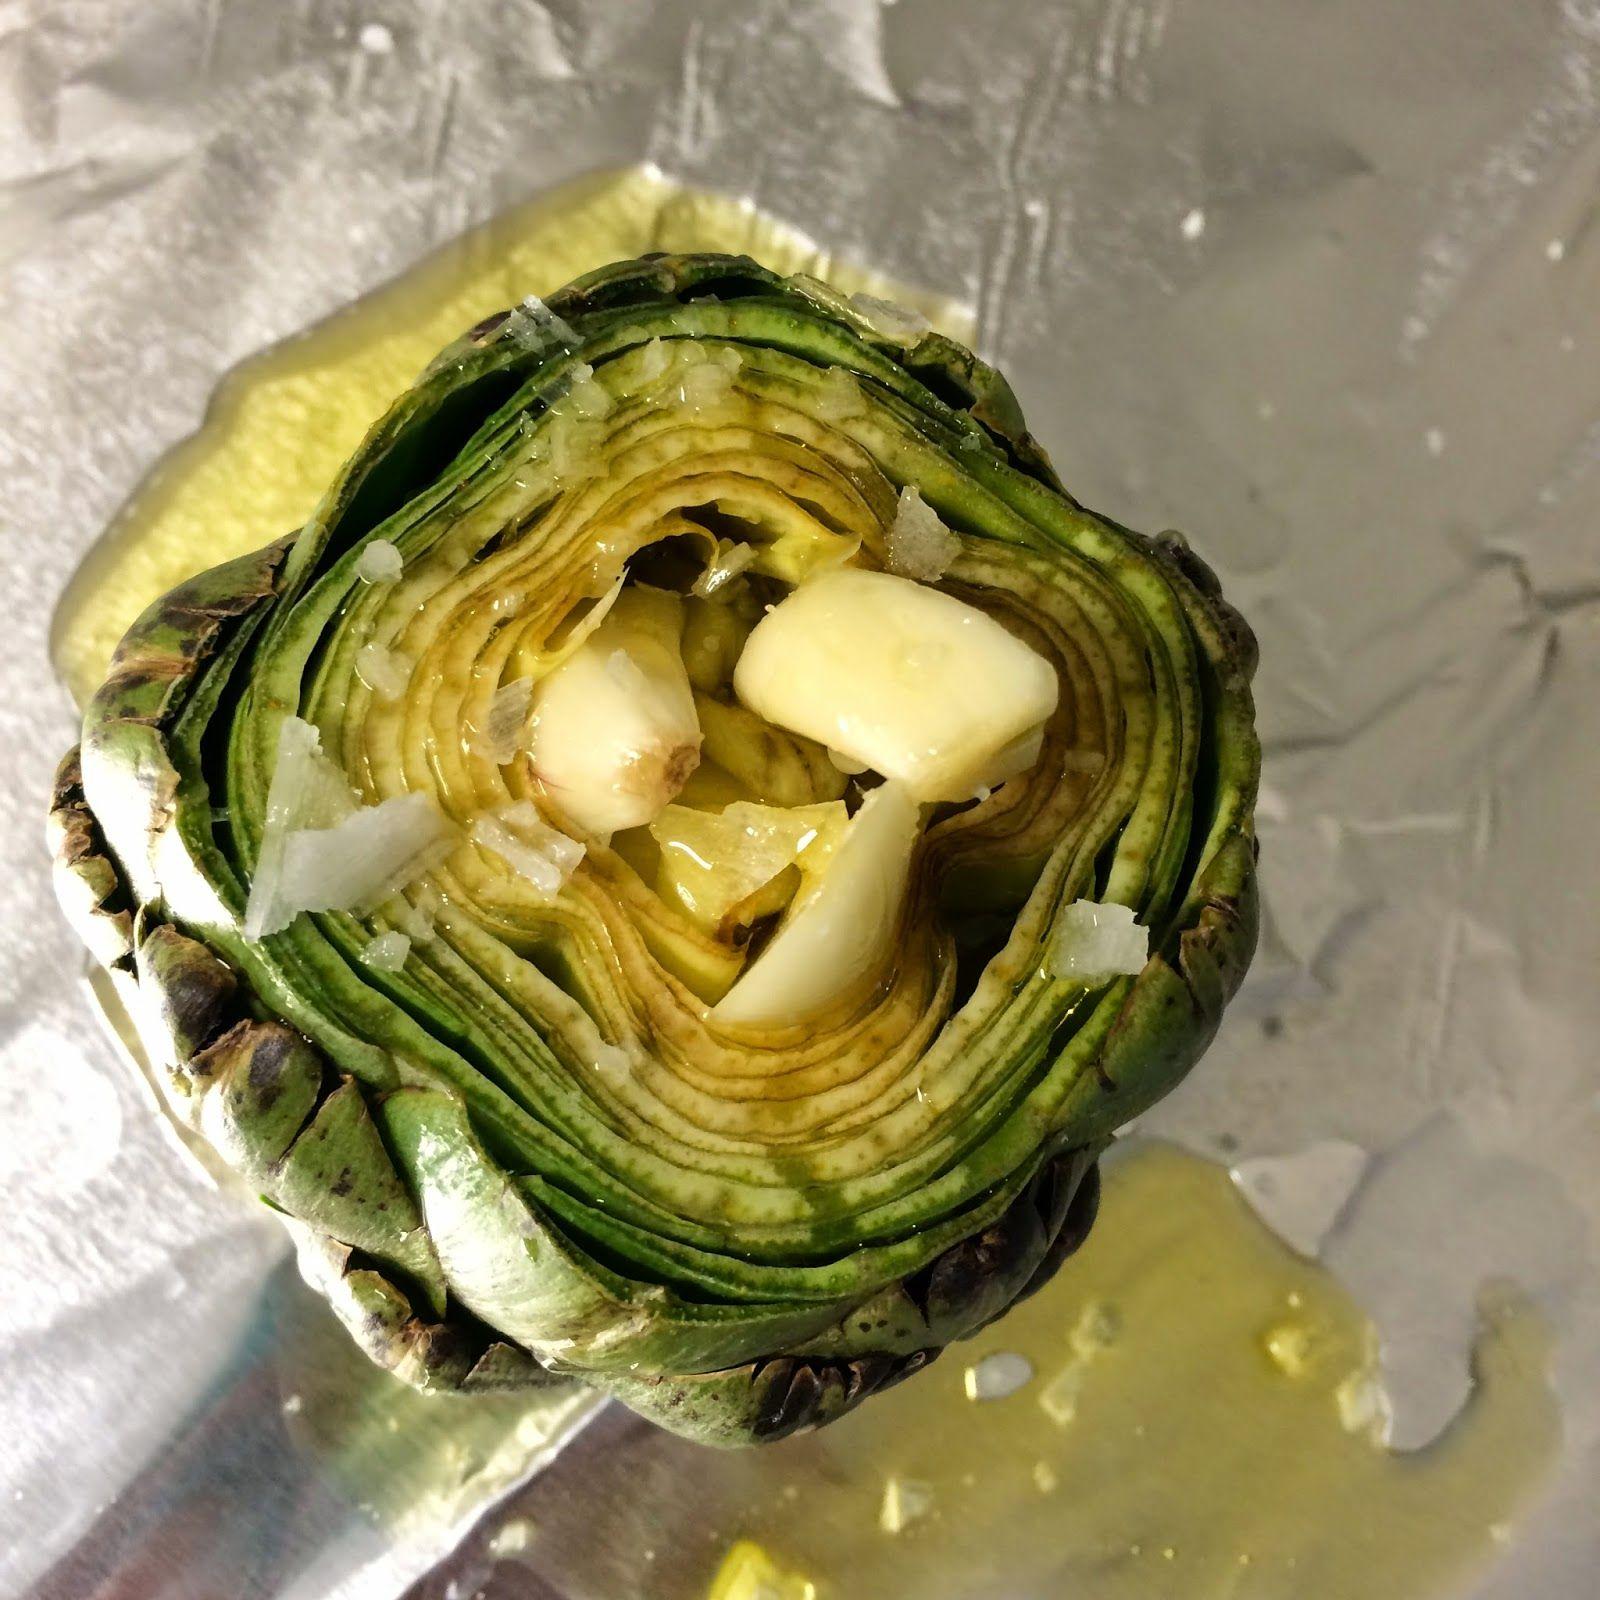 Garlic stuffed roasted artichoke